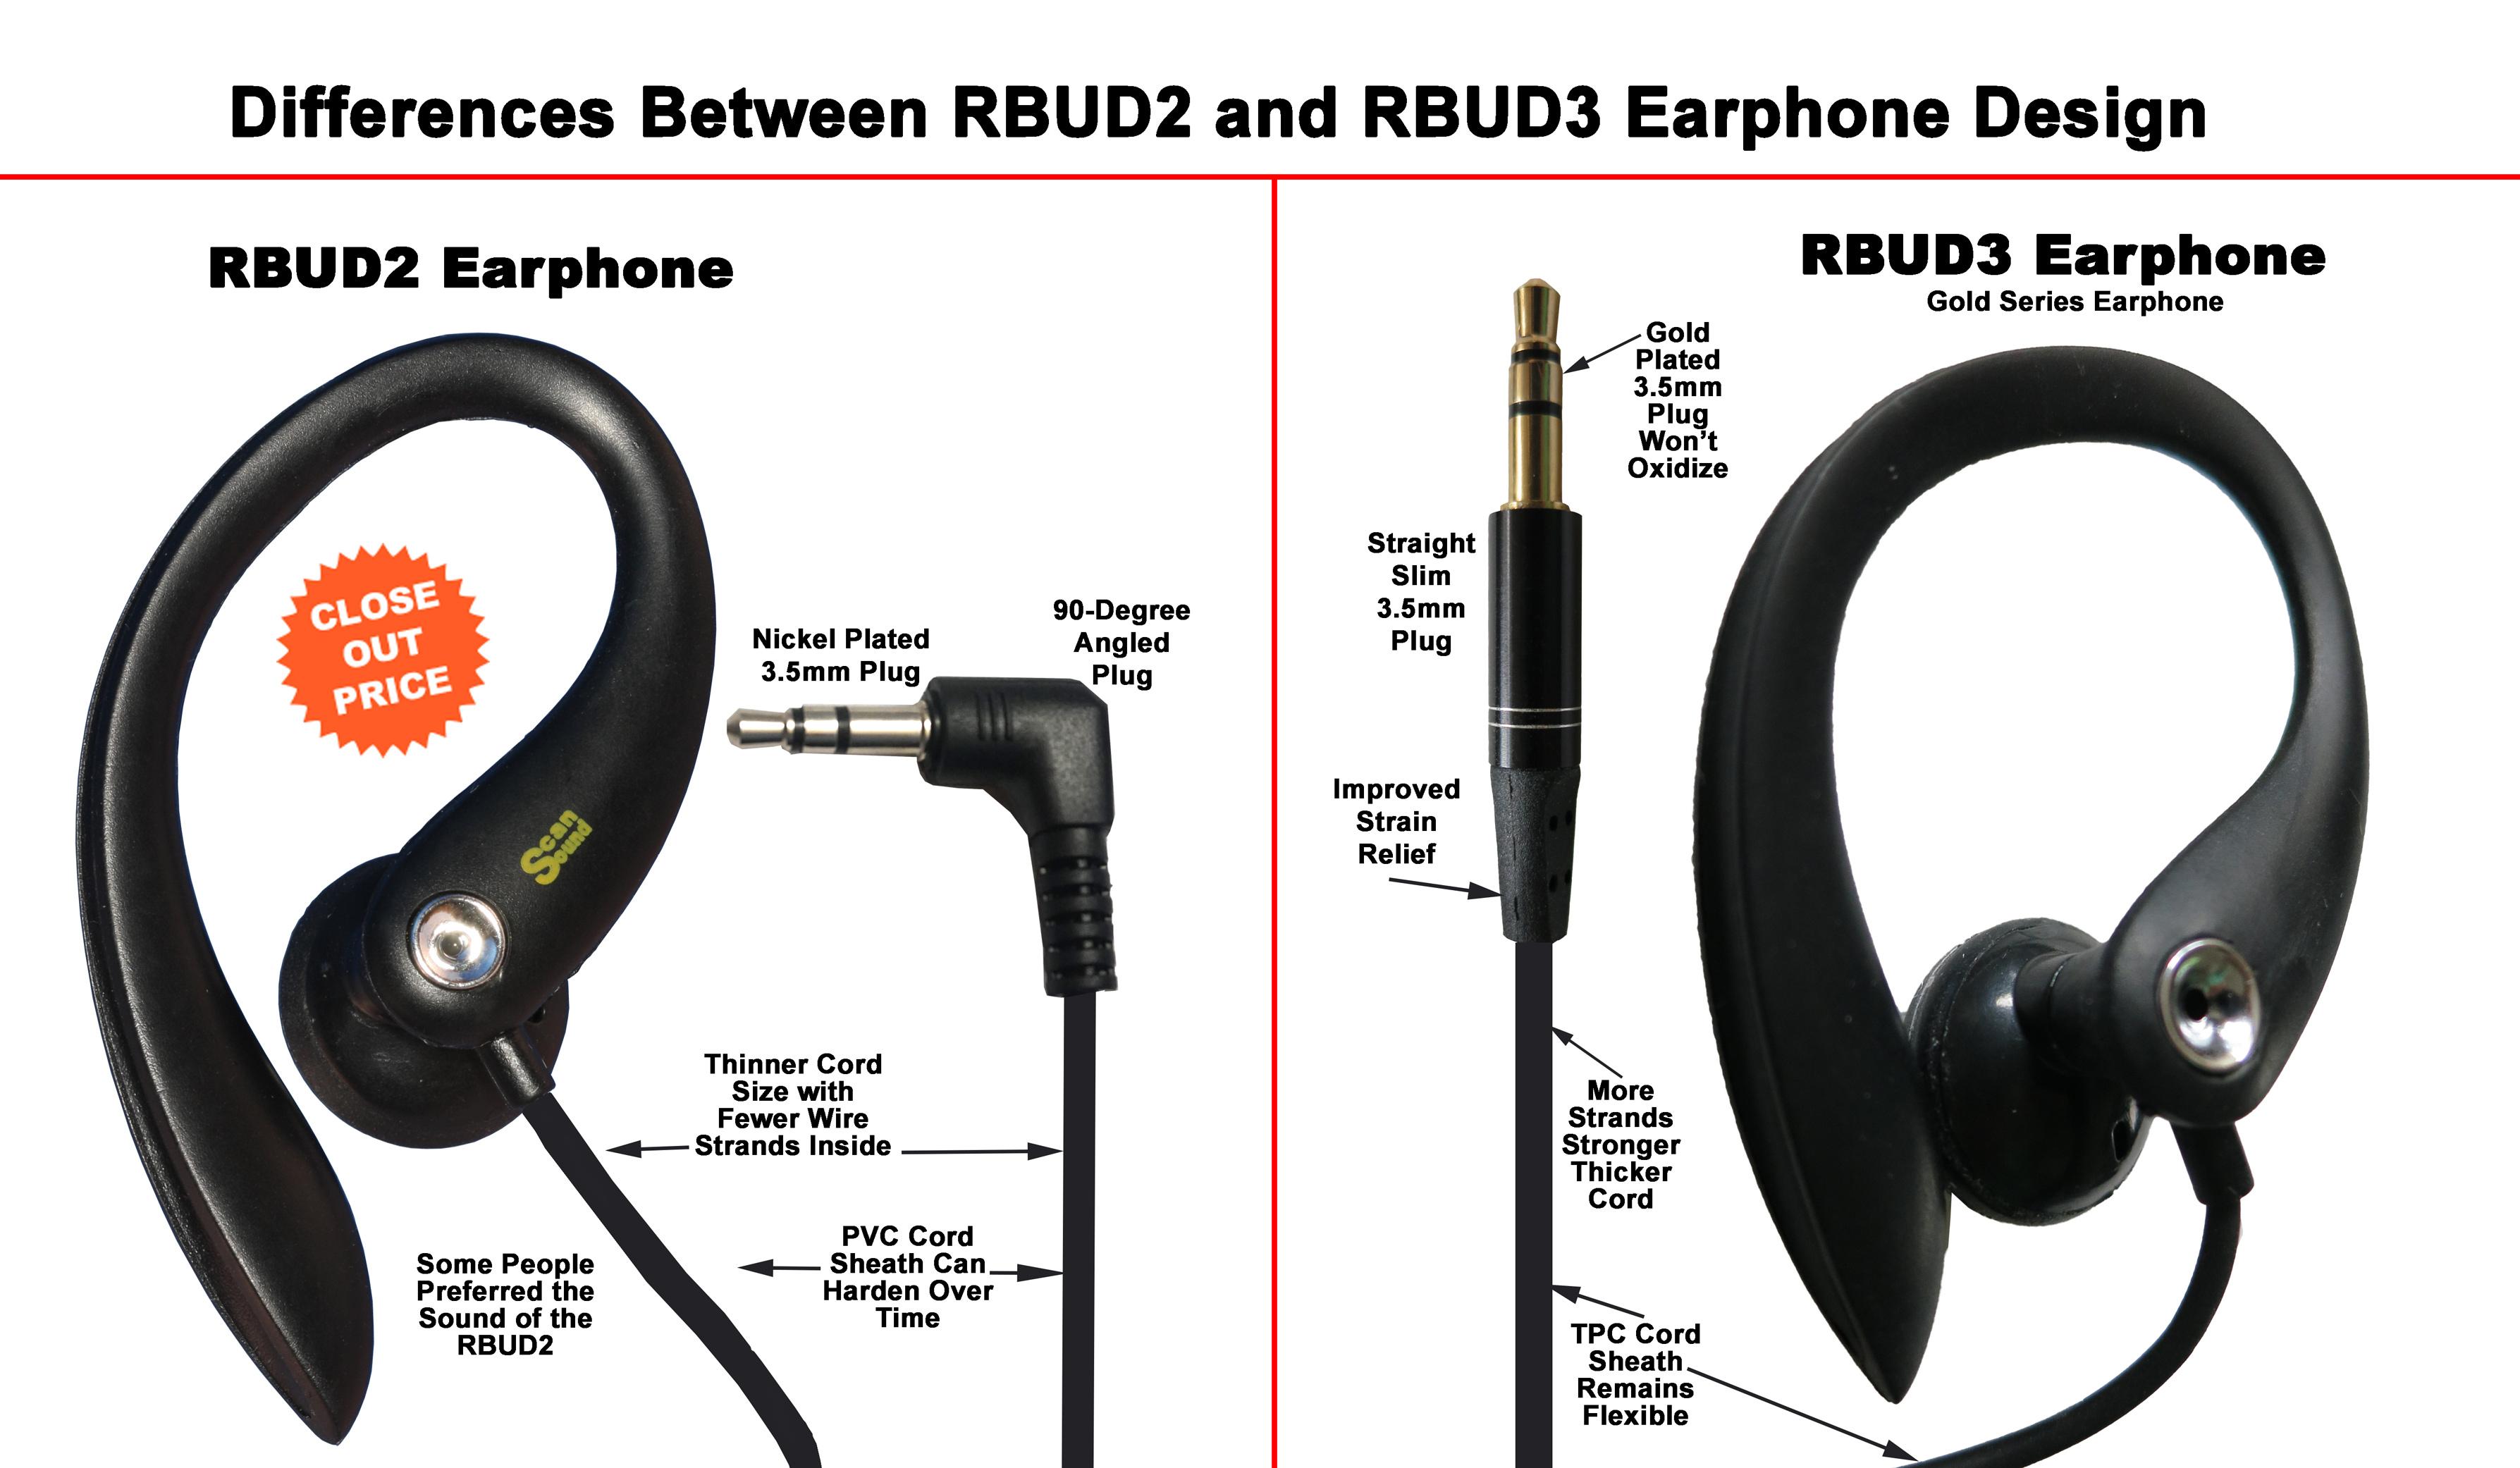 Comparison Between RBUD2 and RBUD3 Earphones